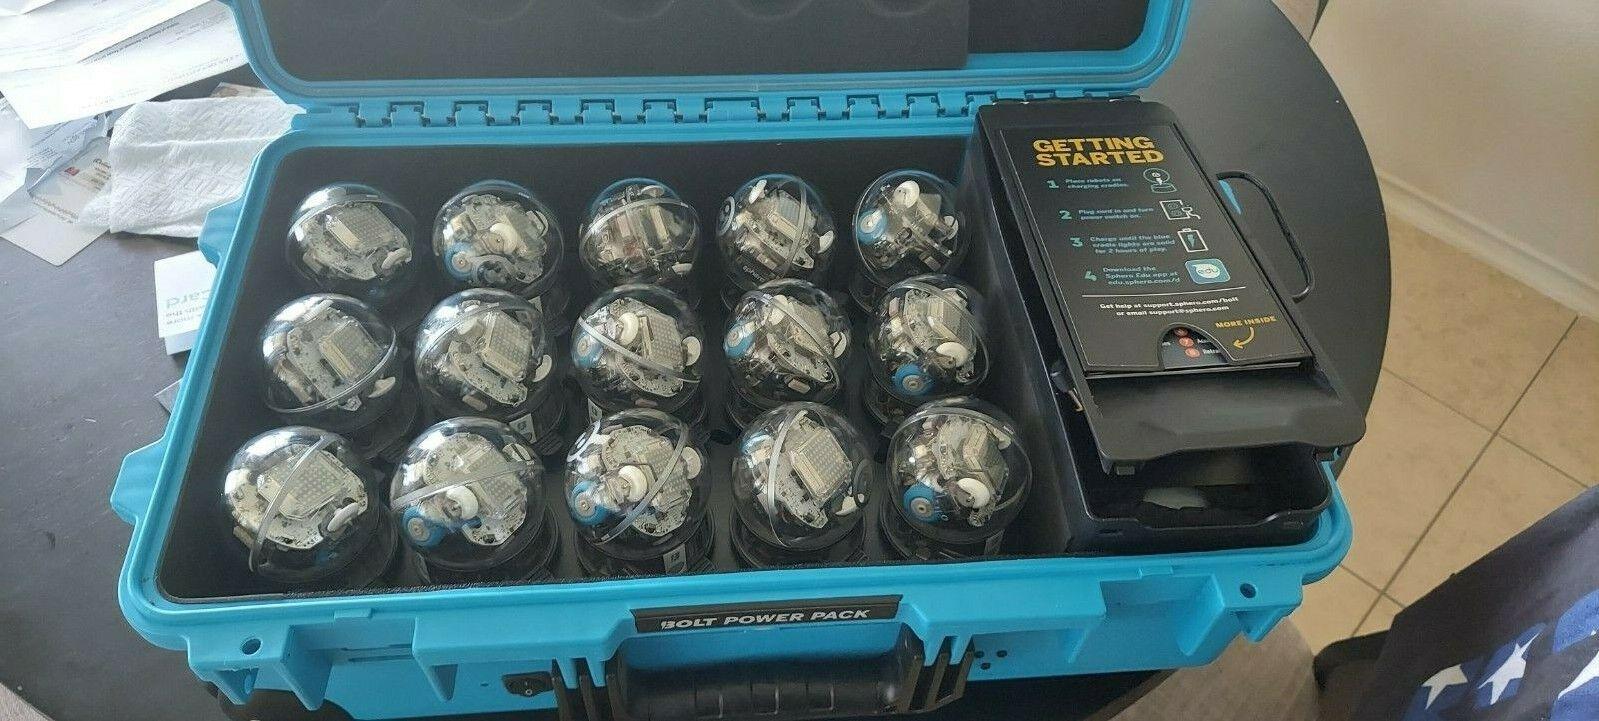 sphero bolt power pack - 15 codingprogrammable robots + char